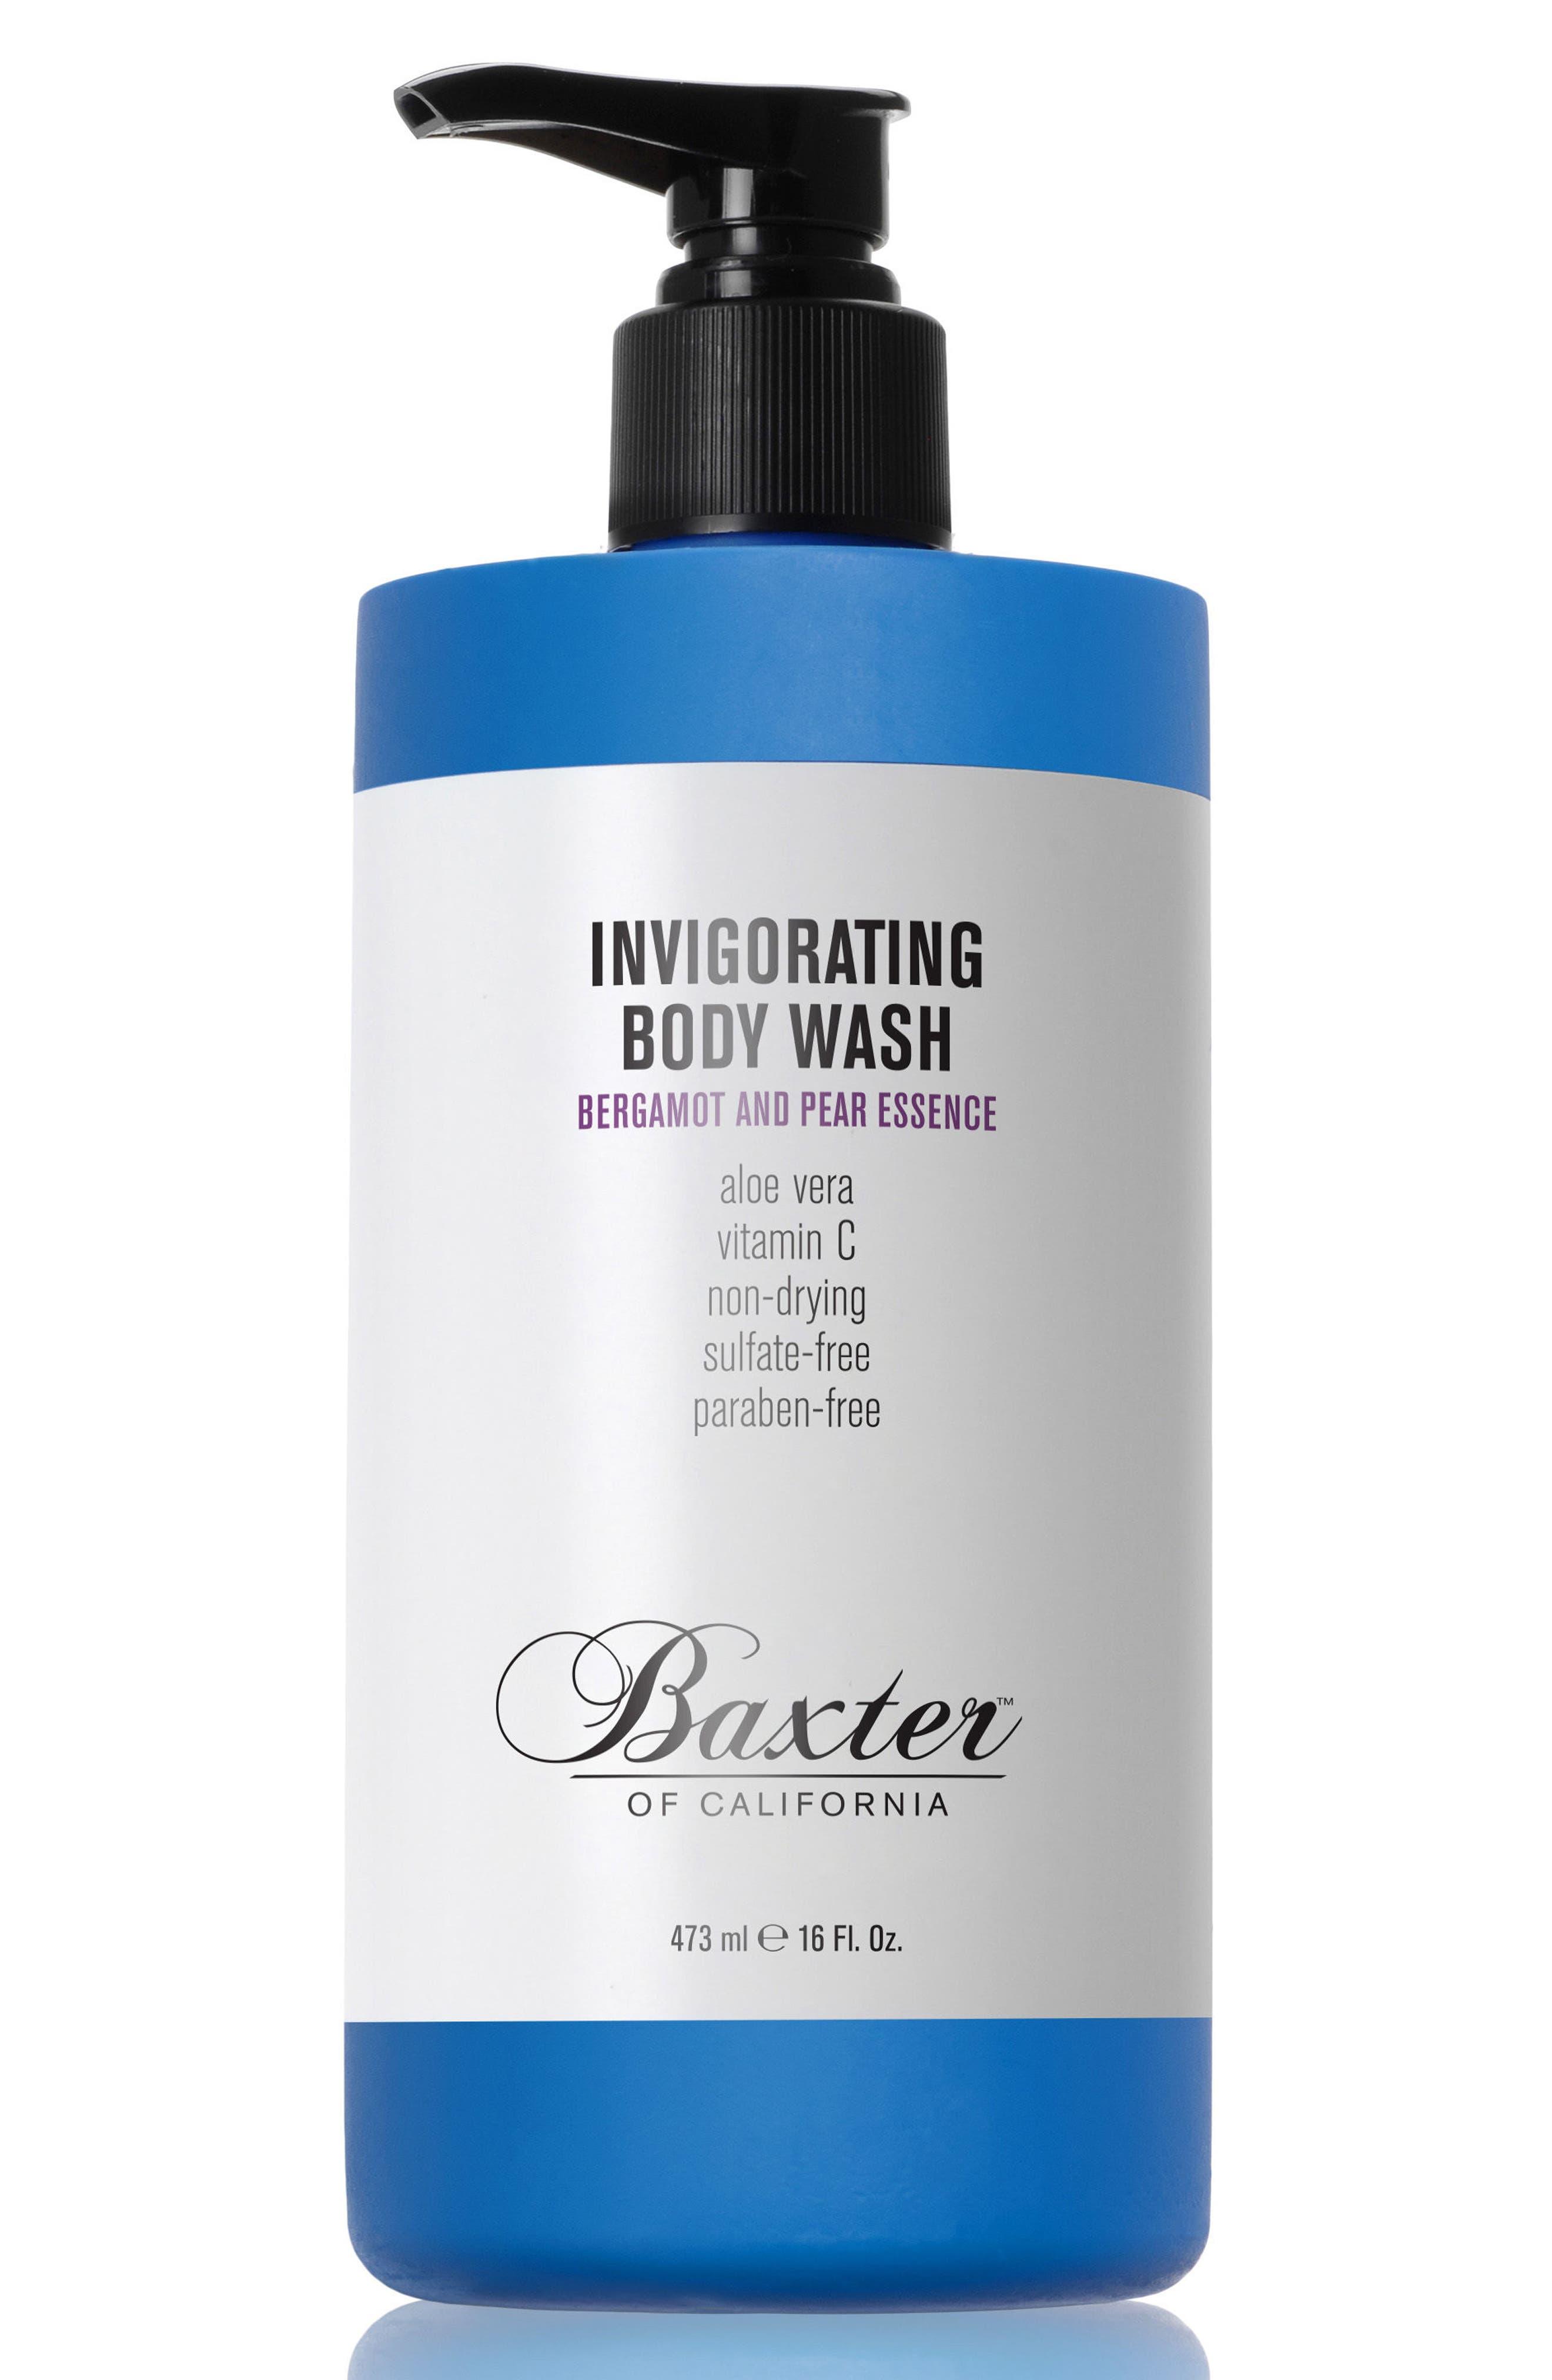 Baxter Of California BERGAMOT & PEAR ESSENCE INVIGORATING BODY WASH